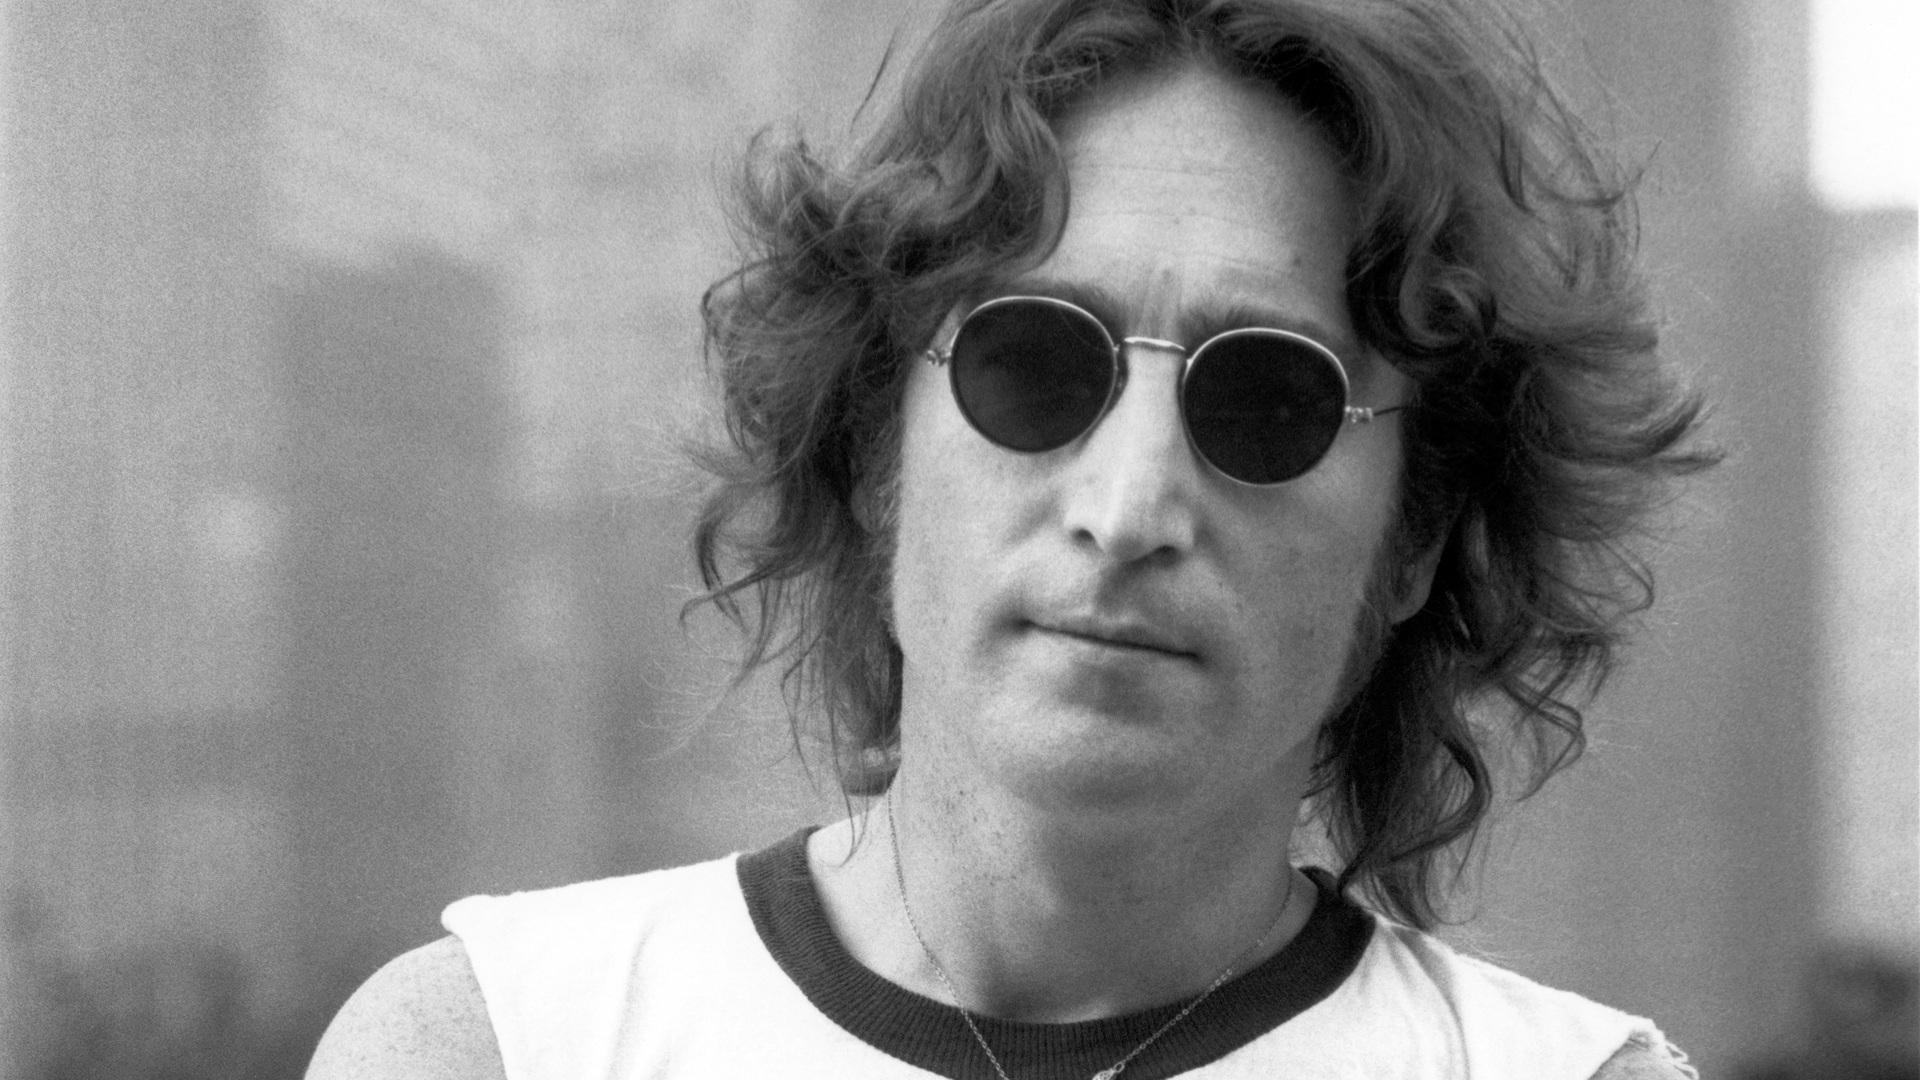 Otro año más sin John Lennon